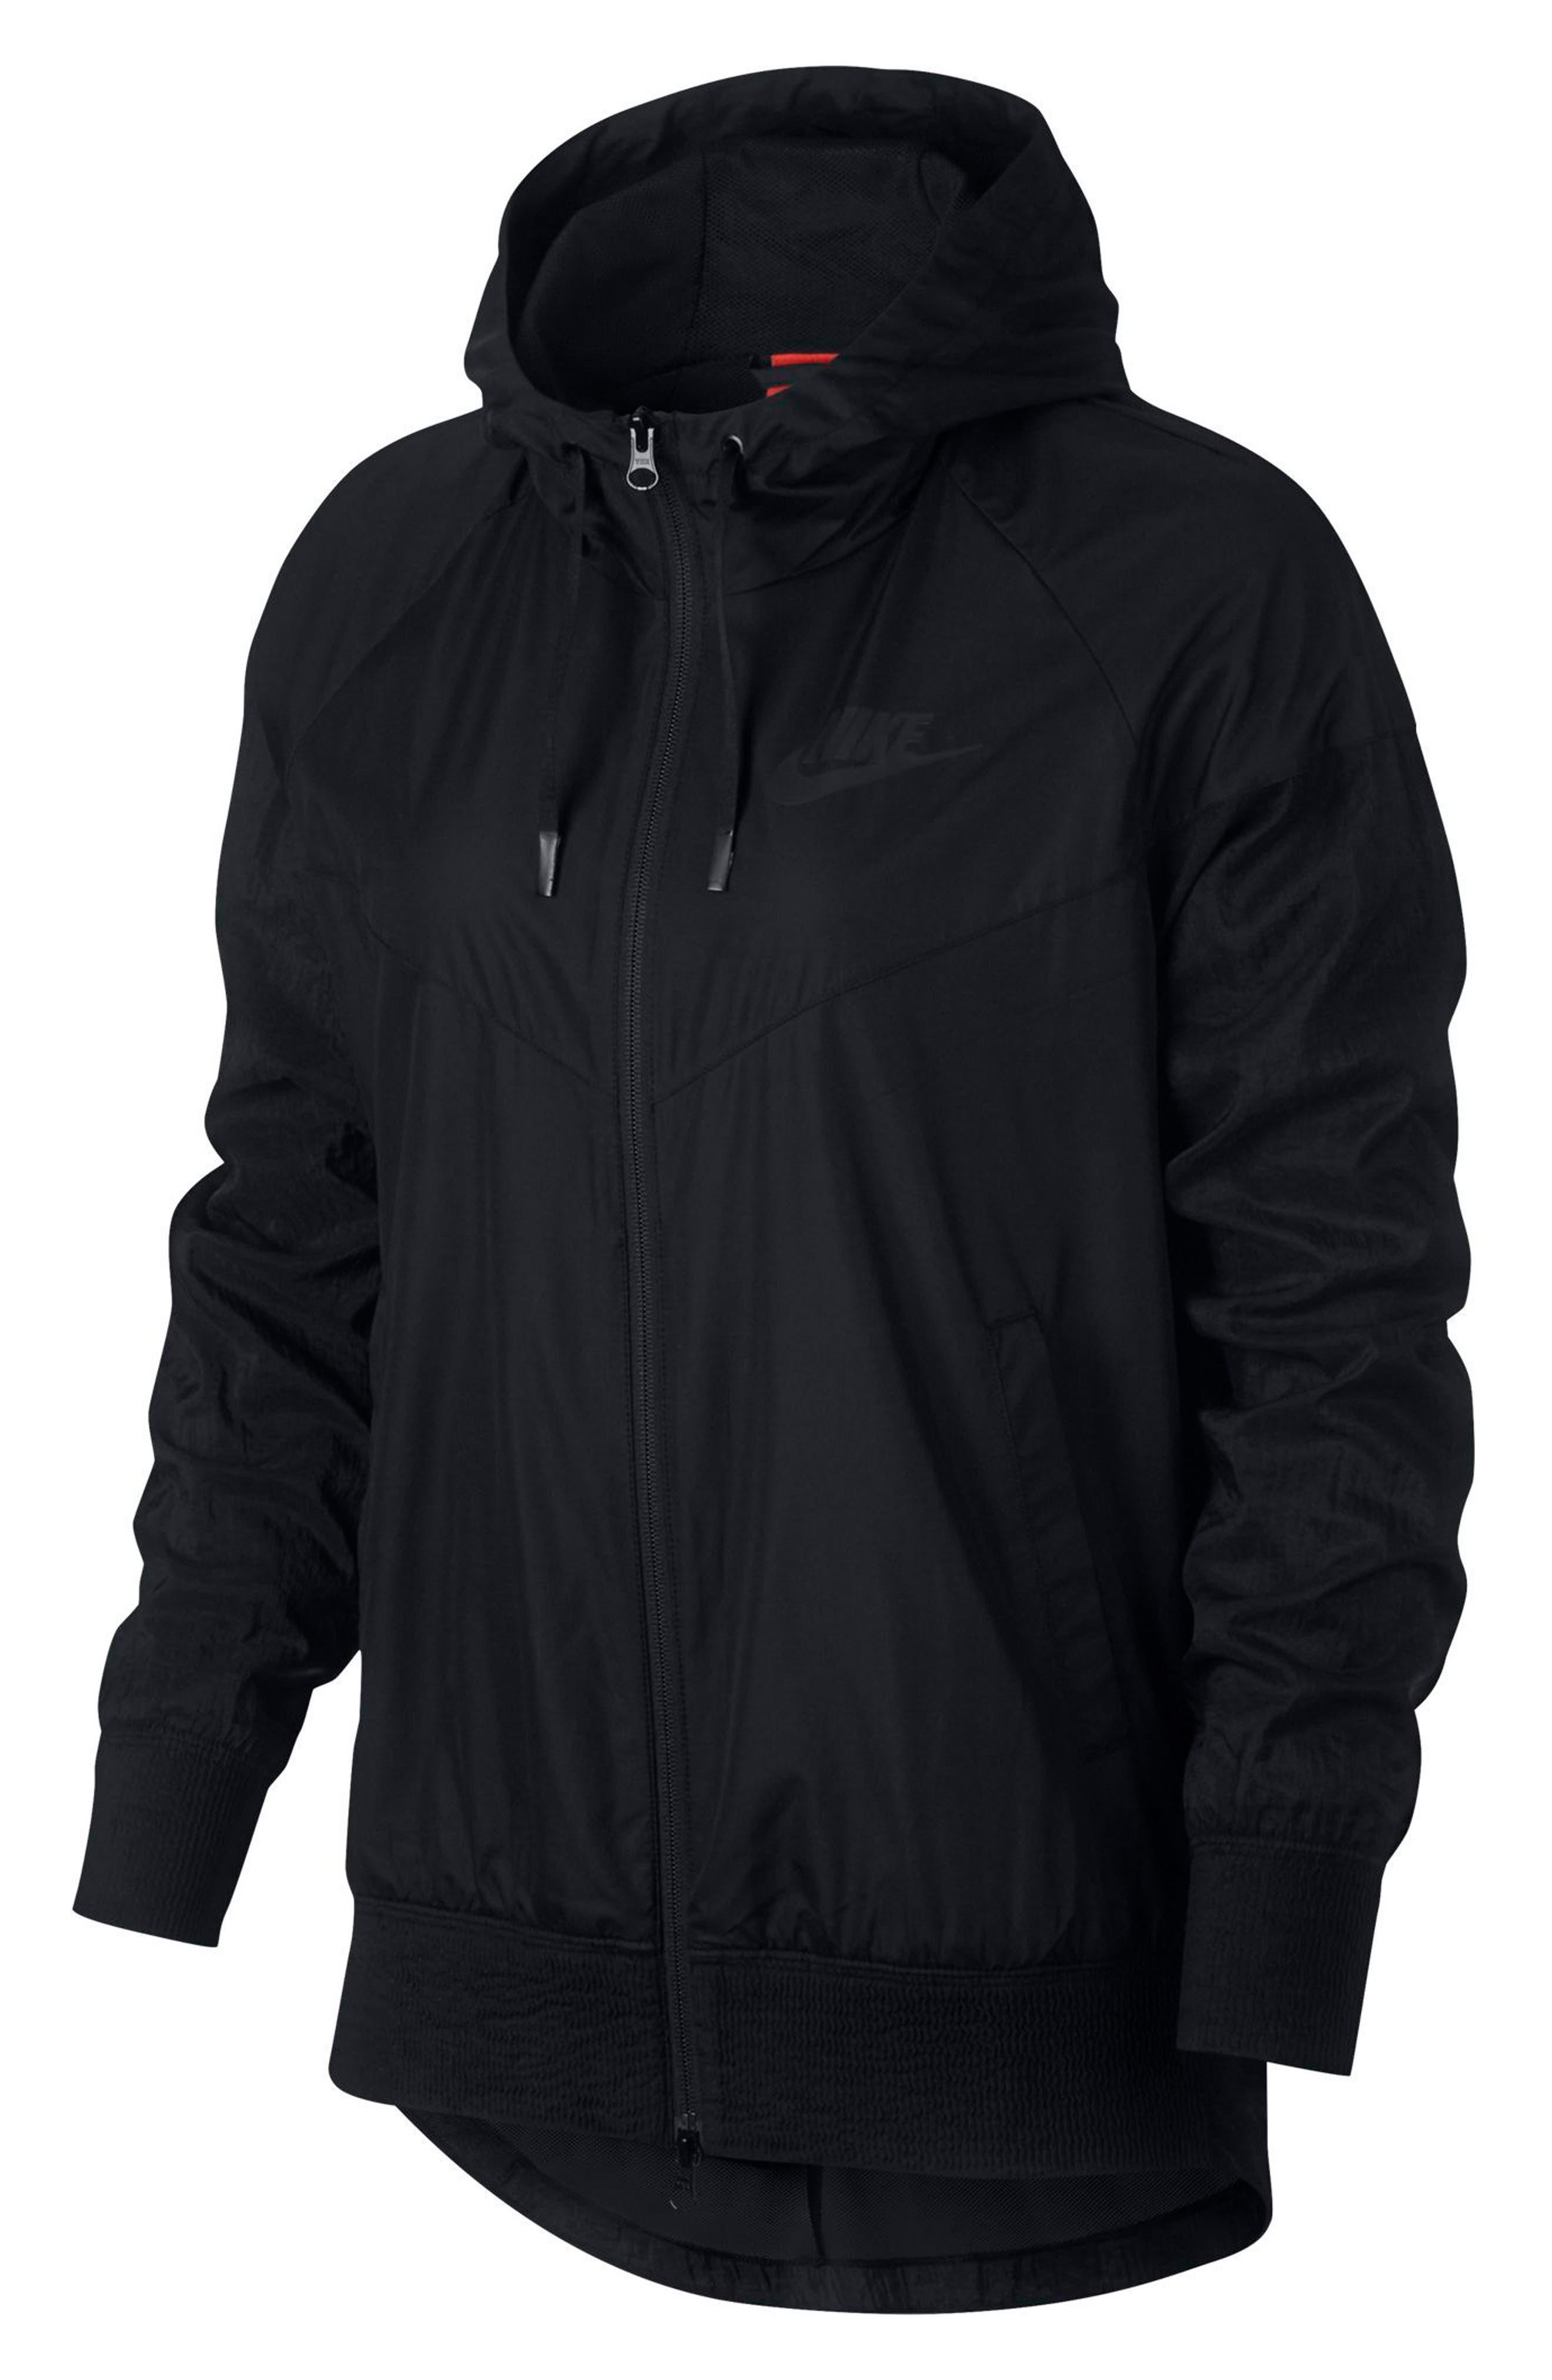 Sportswear Women's Windrunner Water Repellent Jacket,                         Main,                         color, 010